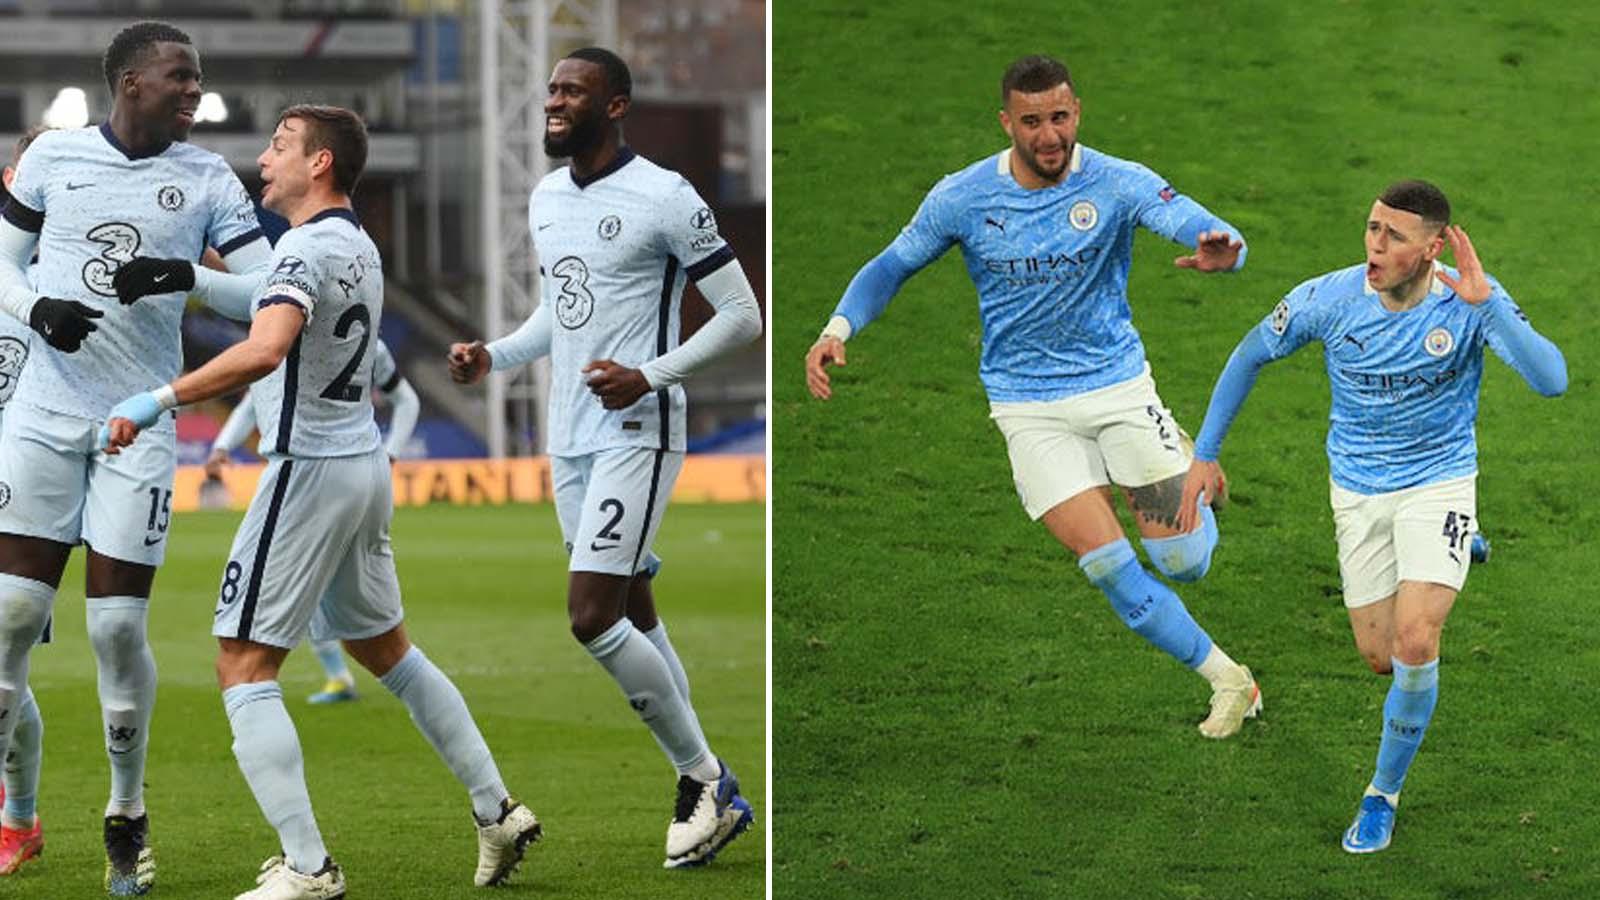 F.A.  Cup'ta yarı final heyecanı: Chelsa- Manchester City'yi Ziyech'in golüyle geçti